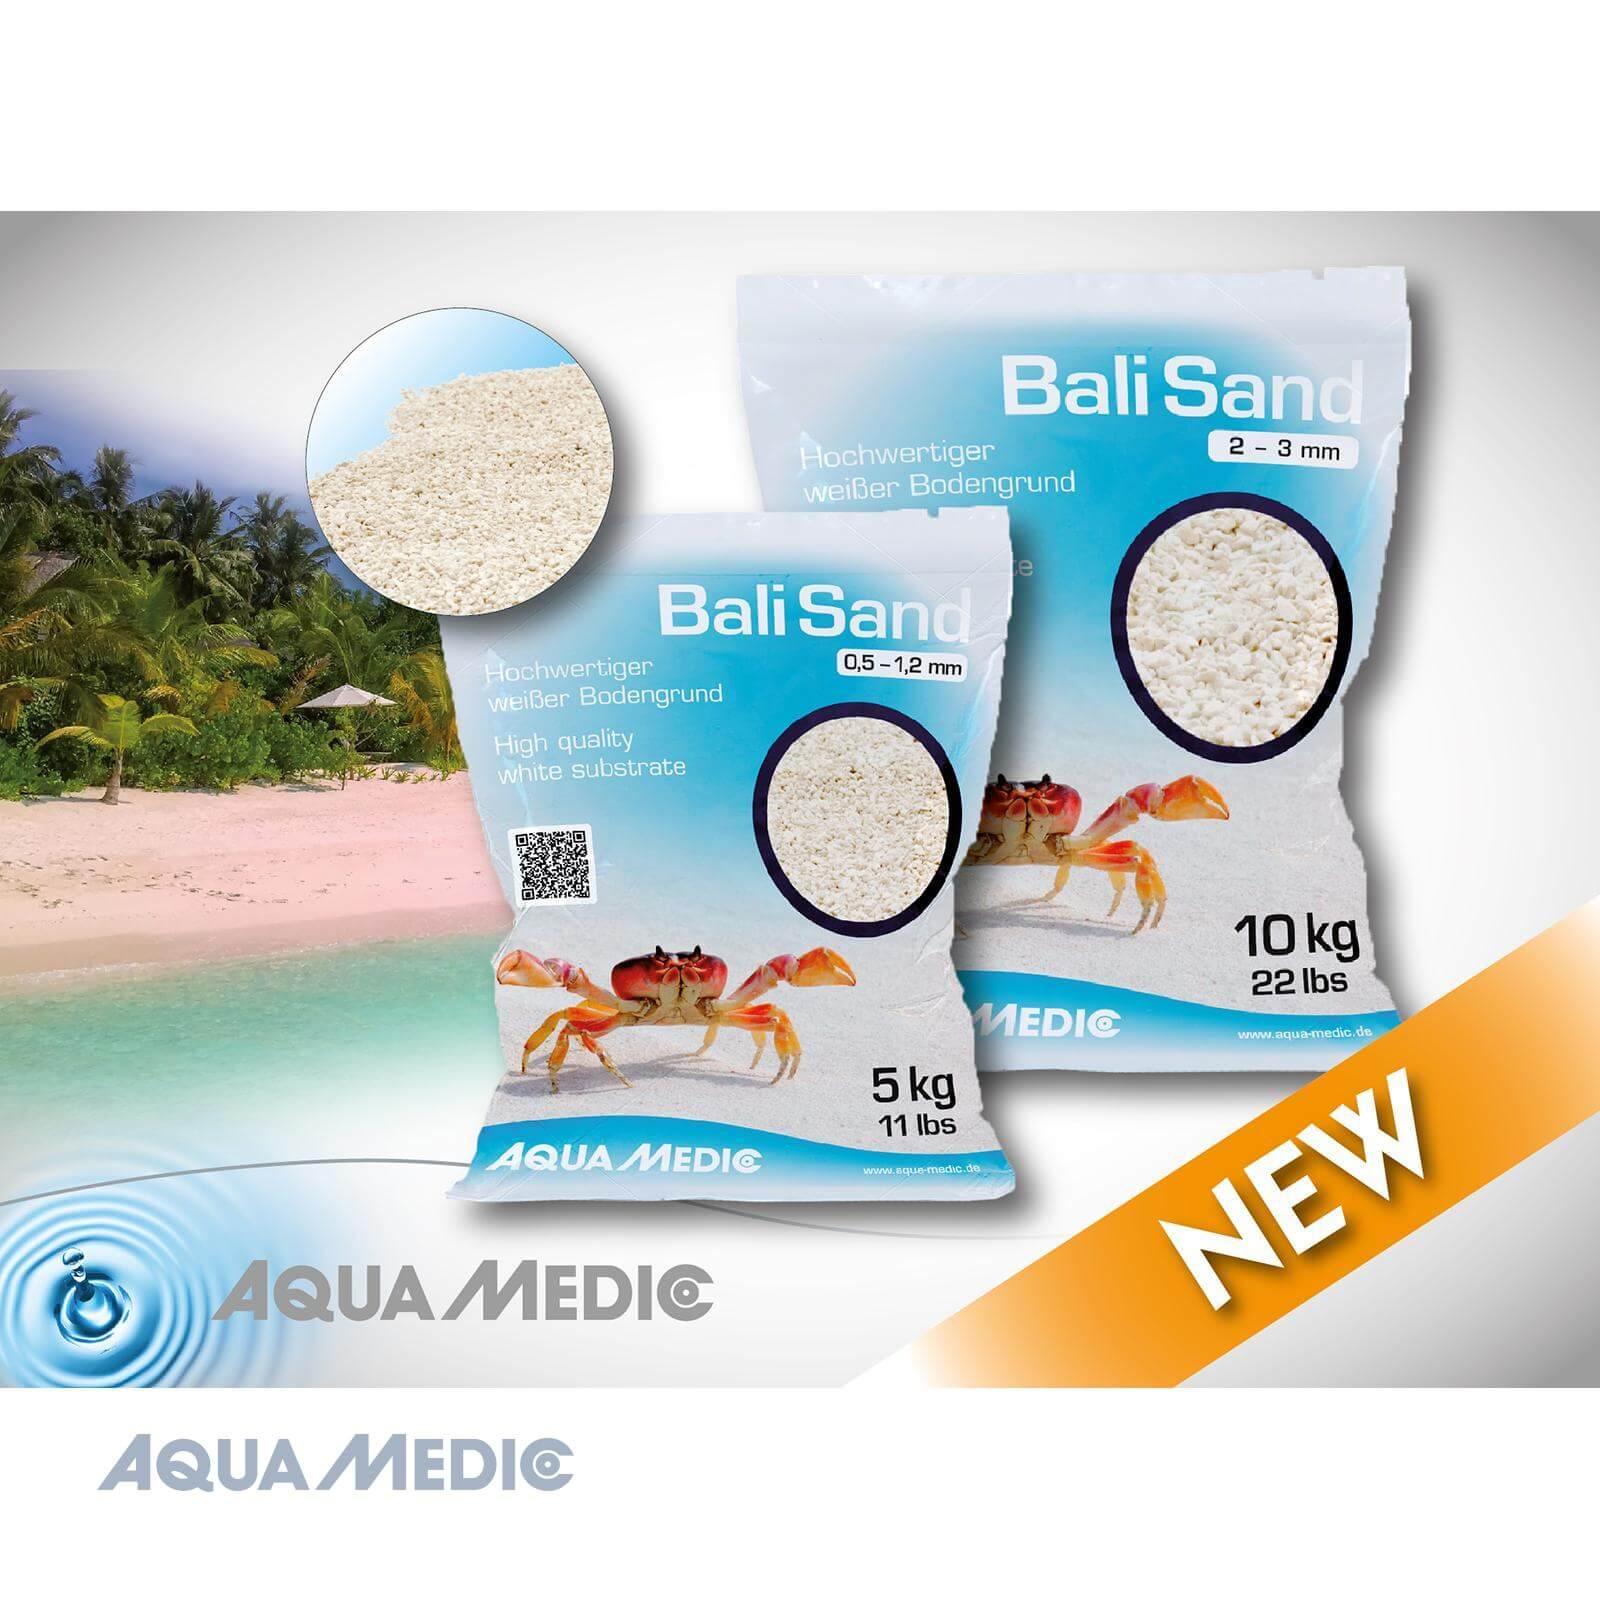 aqua medic bali sand